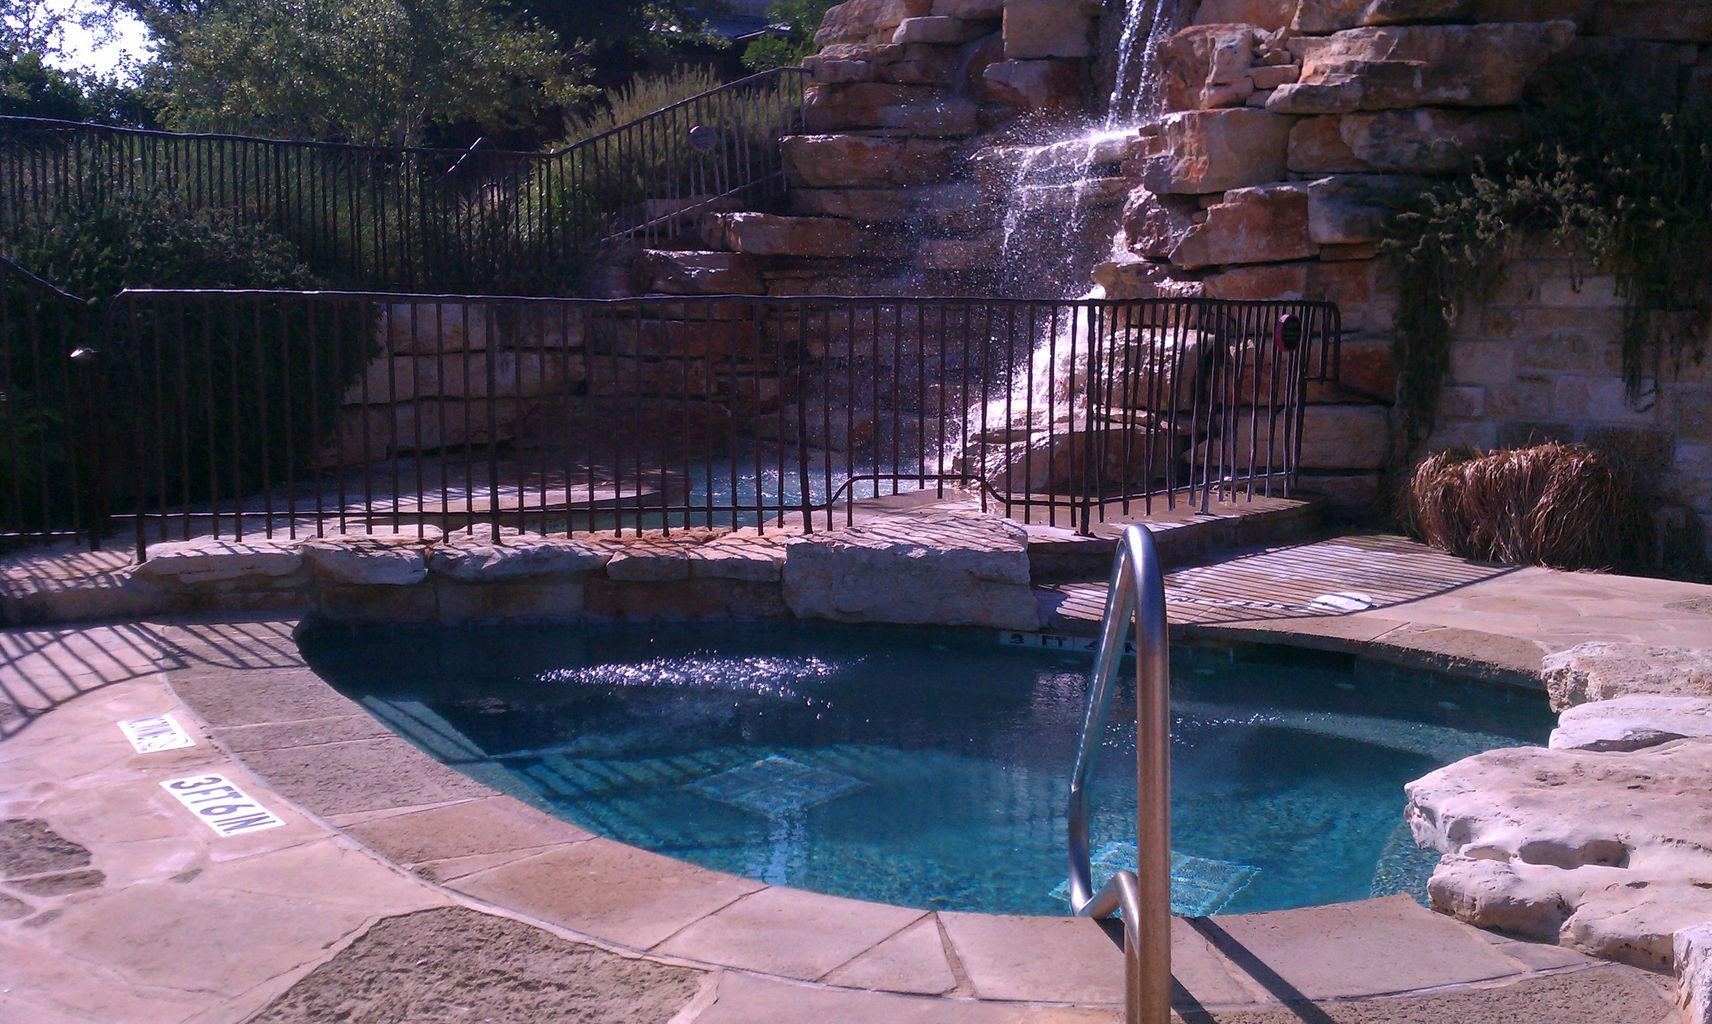 Commercial Swim Pool Repair In Austin Central Texas